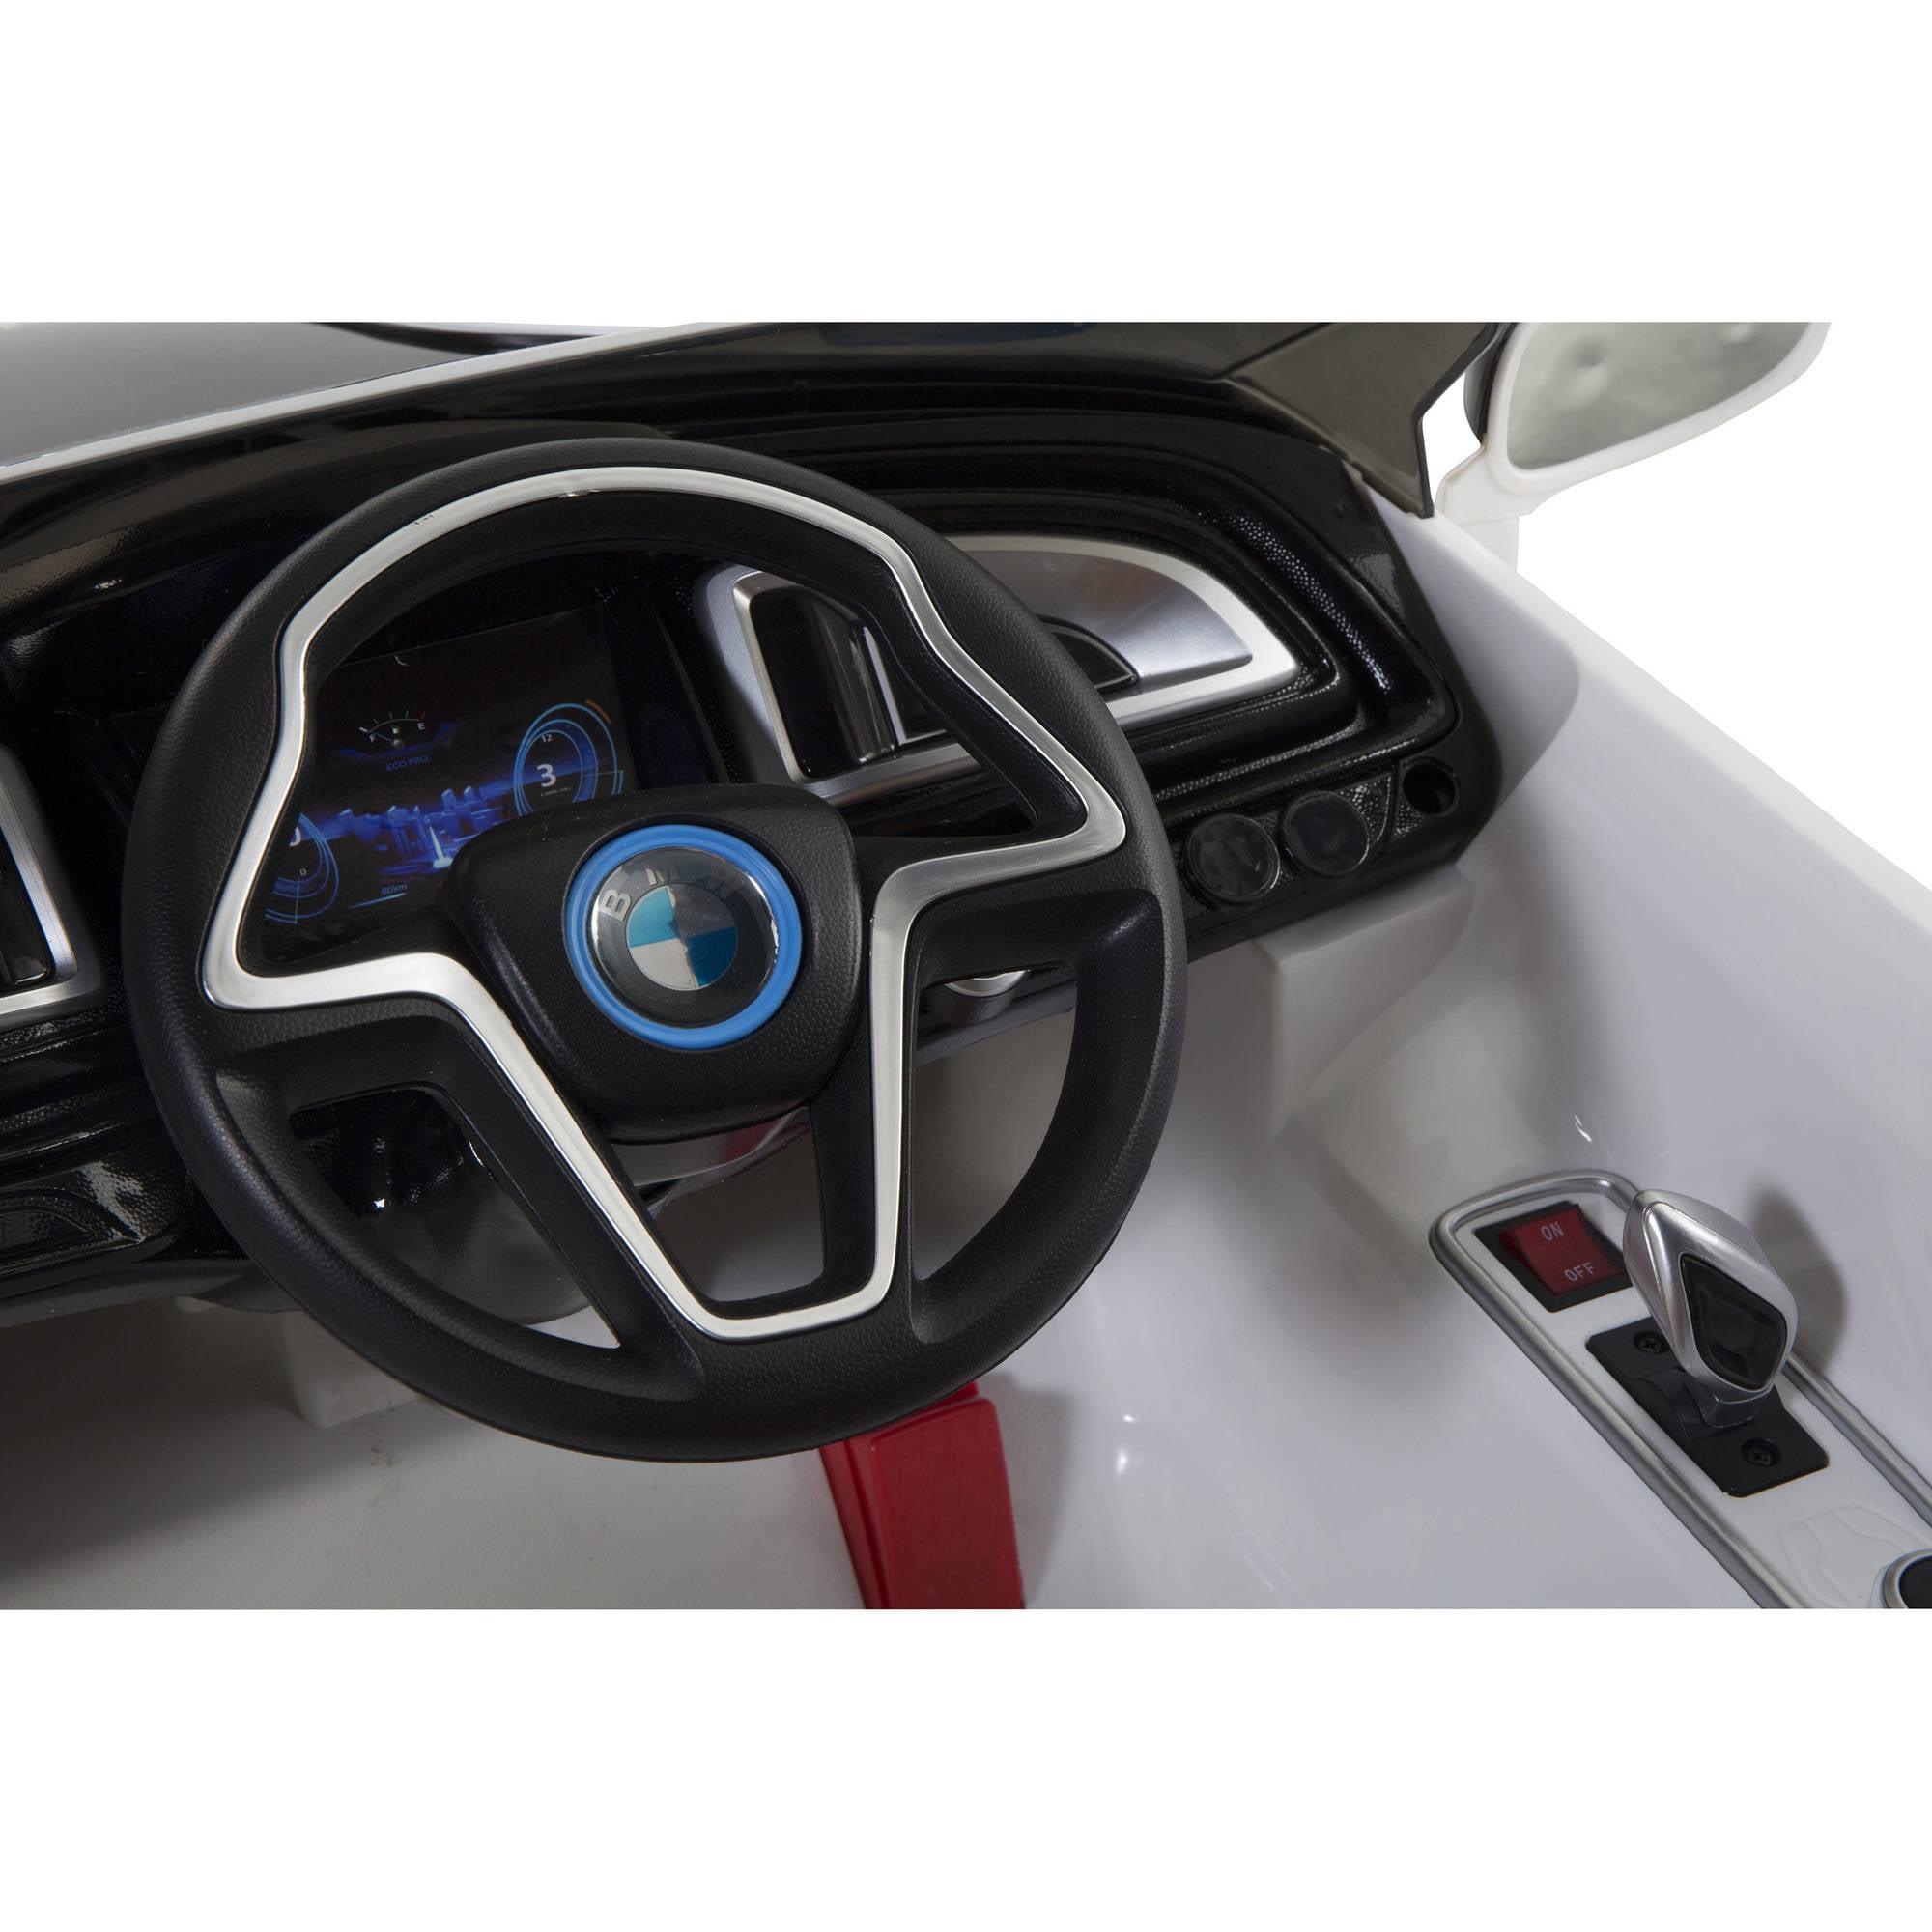 Bmw I8 Concept Car 6 Volt Battery Powered Ride On Walmart Com